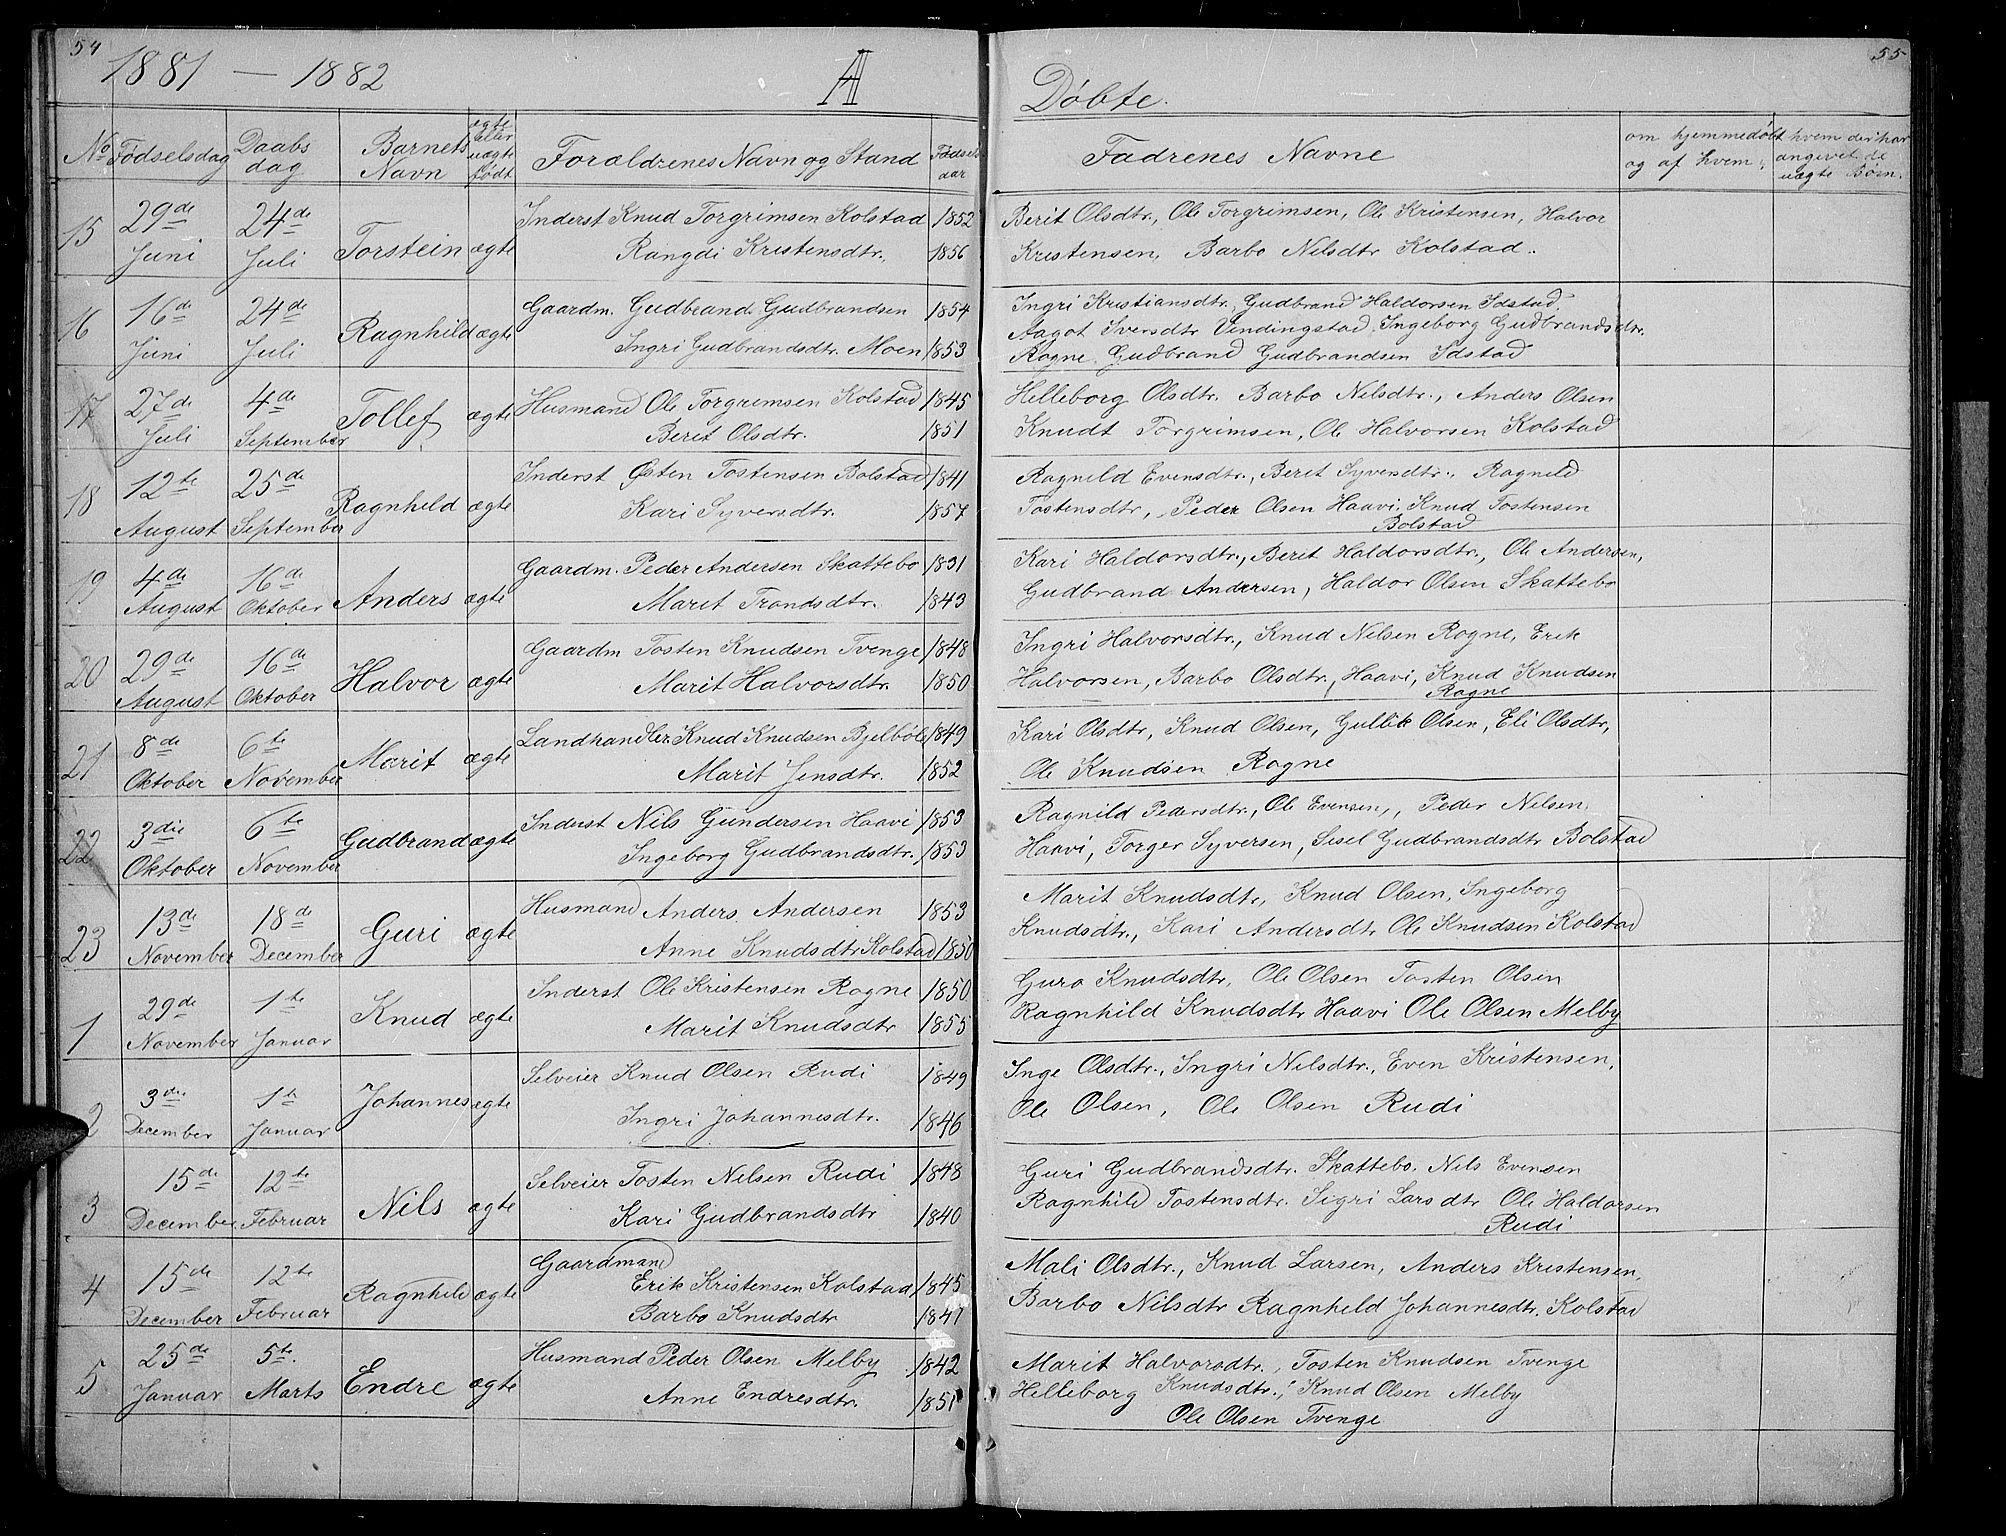 SAH, Øystre Slidre prestekontor, Klokkerbok nr. 3, 1866-1886, s. 54-55